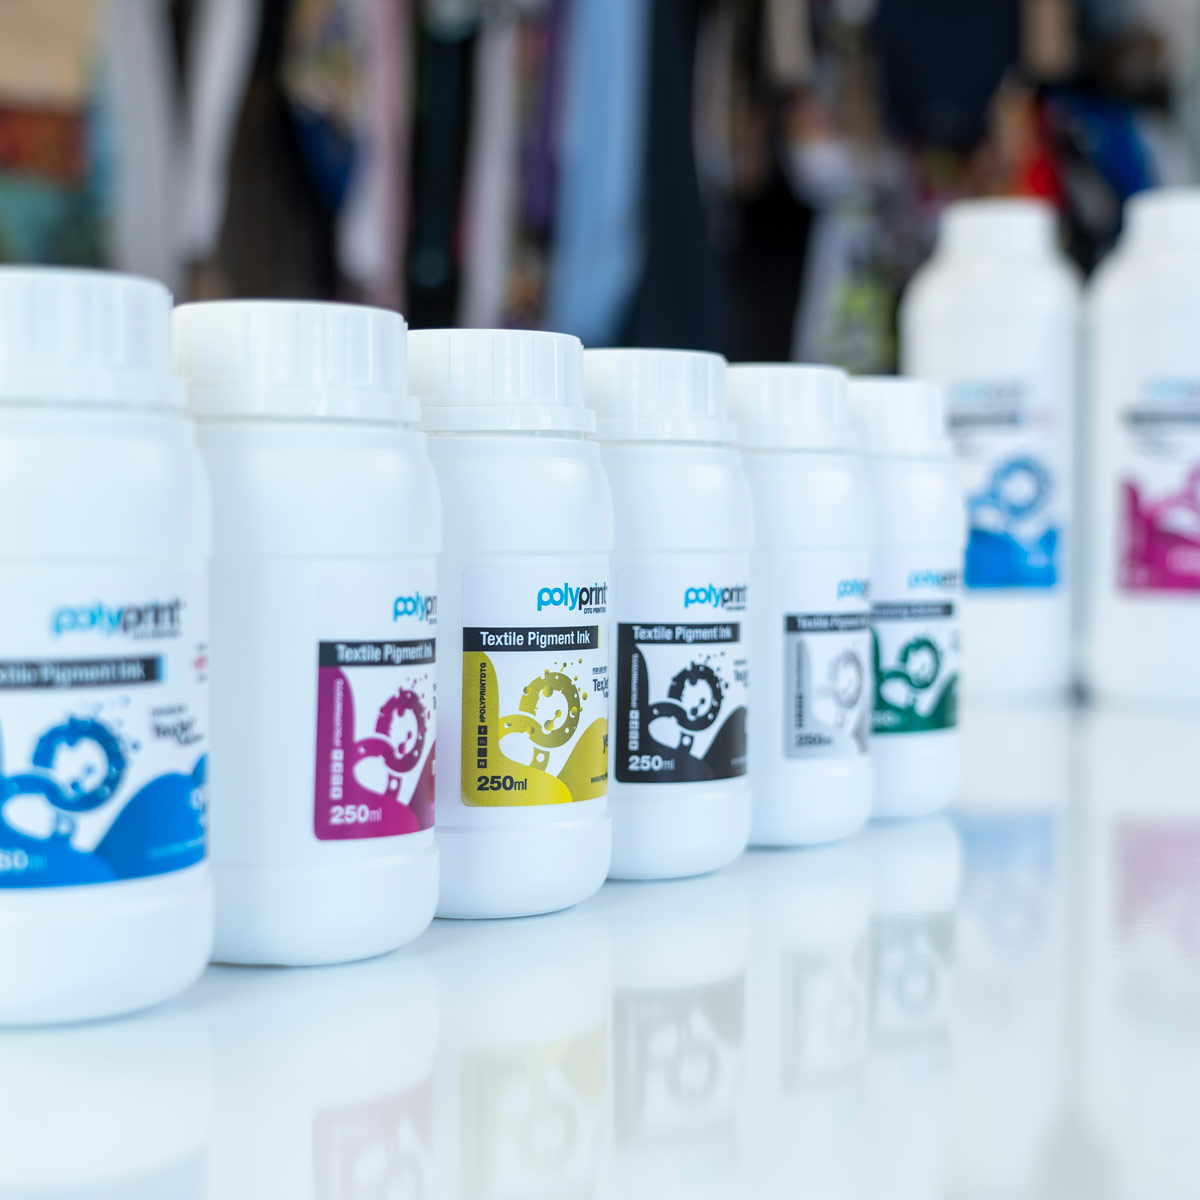 Polyprint Dupont Textile Pigment Inks 250ml